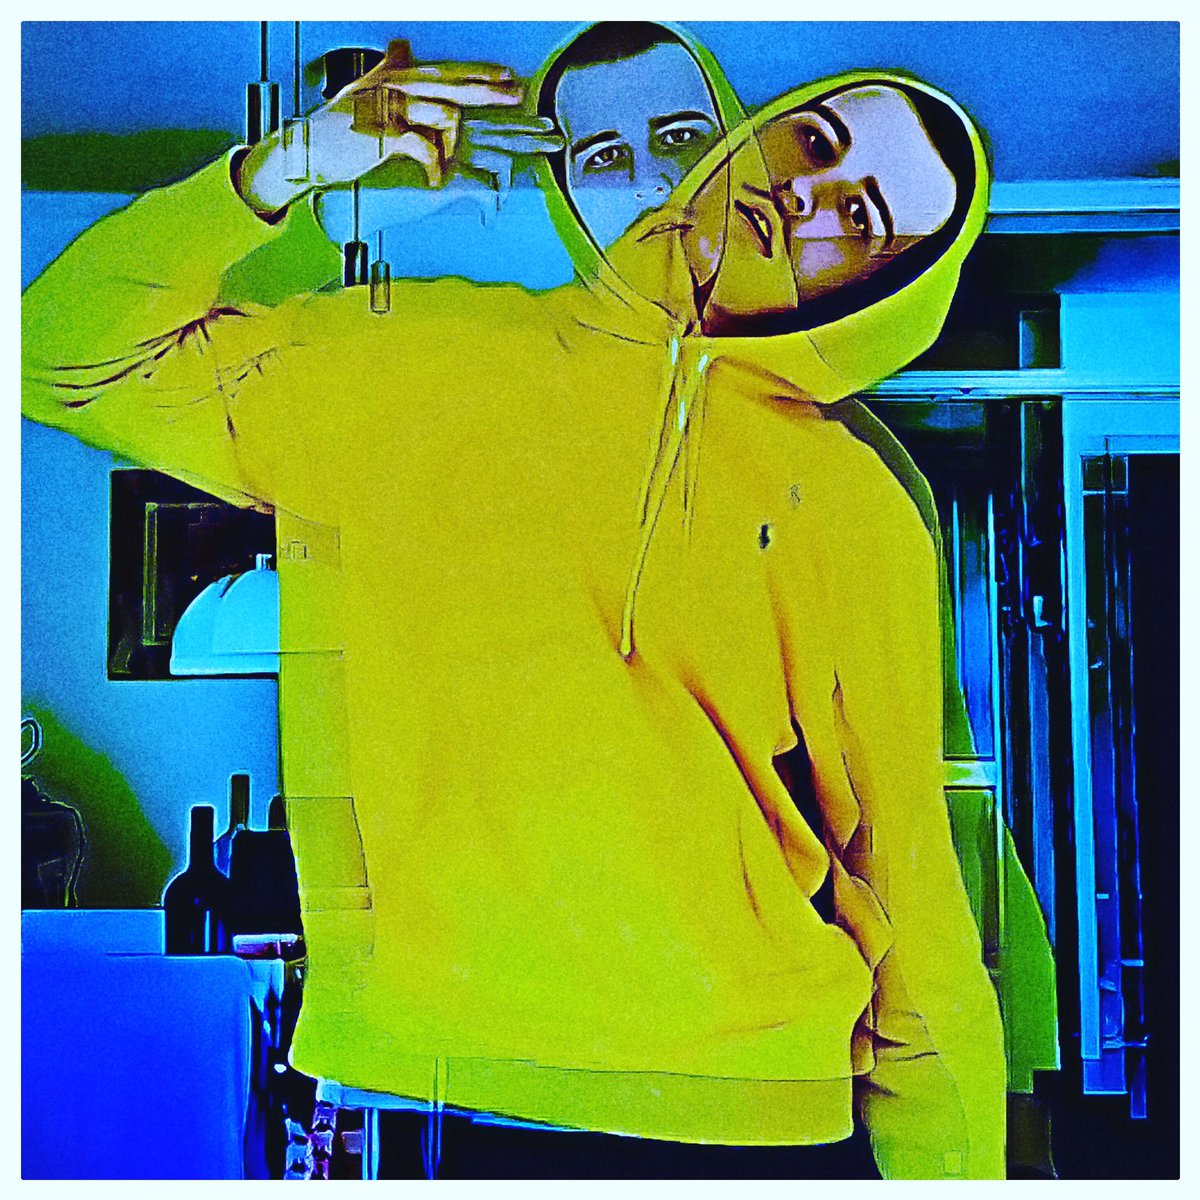 #todayimwearingthis #styleiswhat #justaddsole #shoeoftheday #madewell  #everydaymadewell #mrporterlive #menwithstyle #storyportrait #postmoreportraits #makeportraitsnotwar #chasinglight #justgoshoot #handsinframe #newblogposts #newblog #modeblogger #pasteloftheday #colorlovepic.twitter.com/VK9g16XjD5